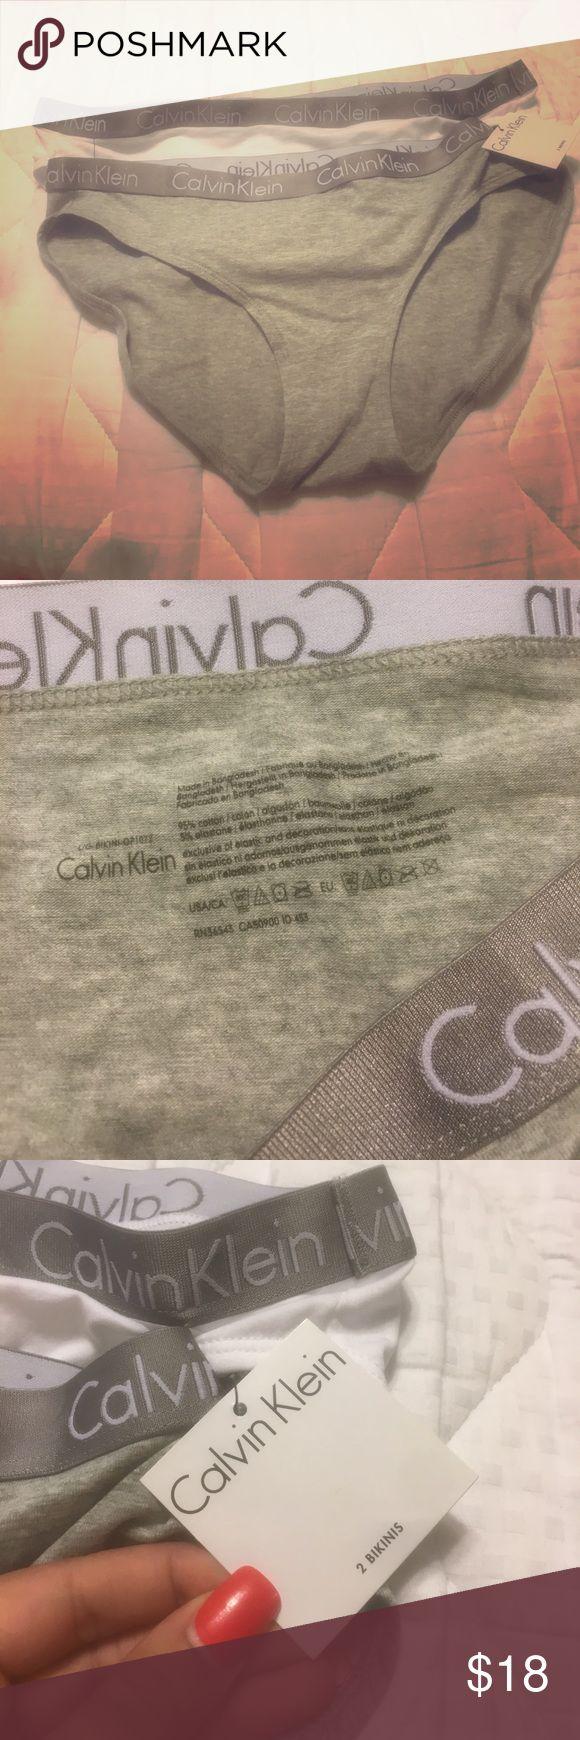 Calvin Klein Bikini Underwear Set Set of 2 bikinis. 95% cotton, 5% elastane. Calvin Klein Underwear Intimates & Sleepwear Panties